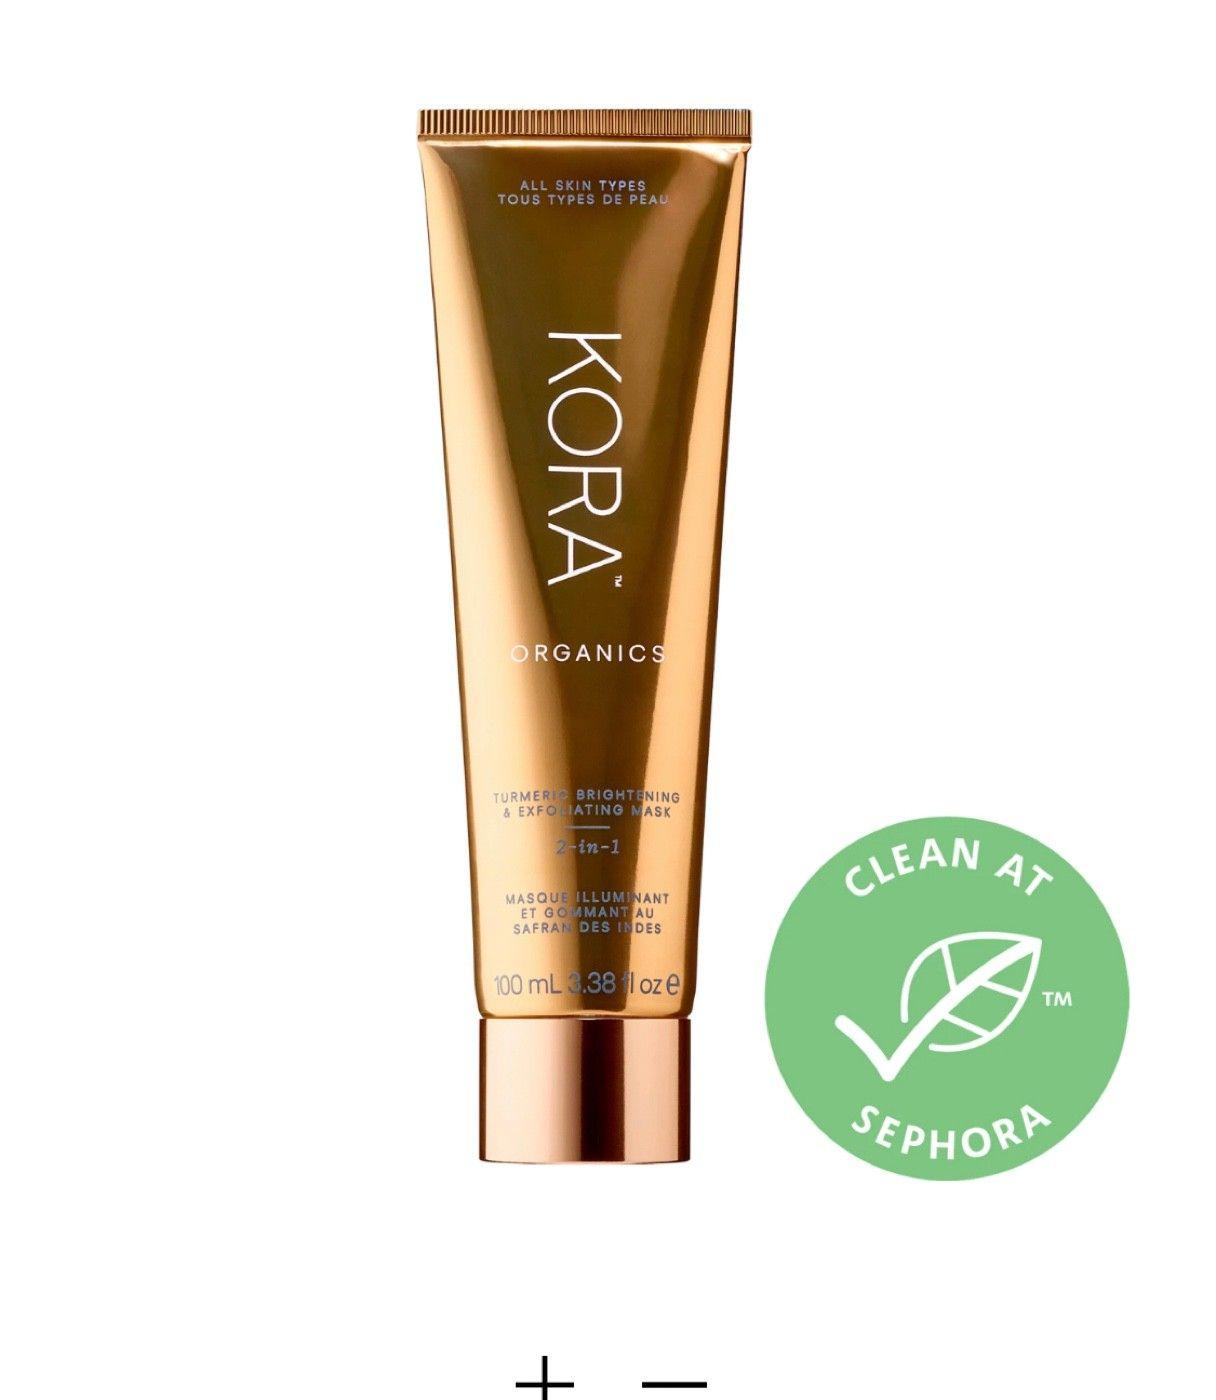 Kora Organics turmeric brightening and exfoliating mask